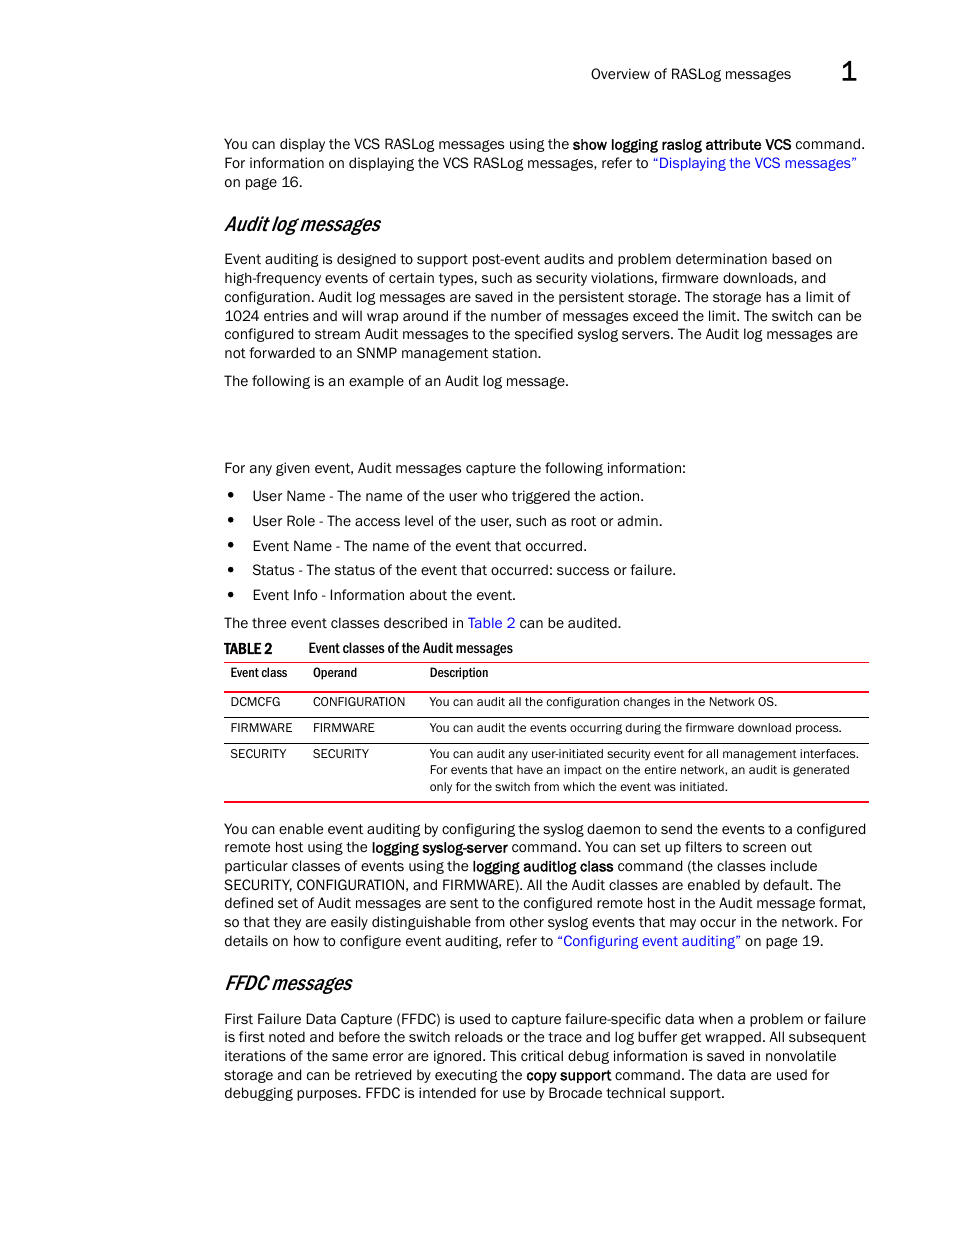 Audit log messages, Ffdc messages | Brocade Network OS